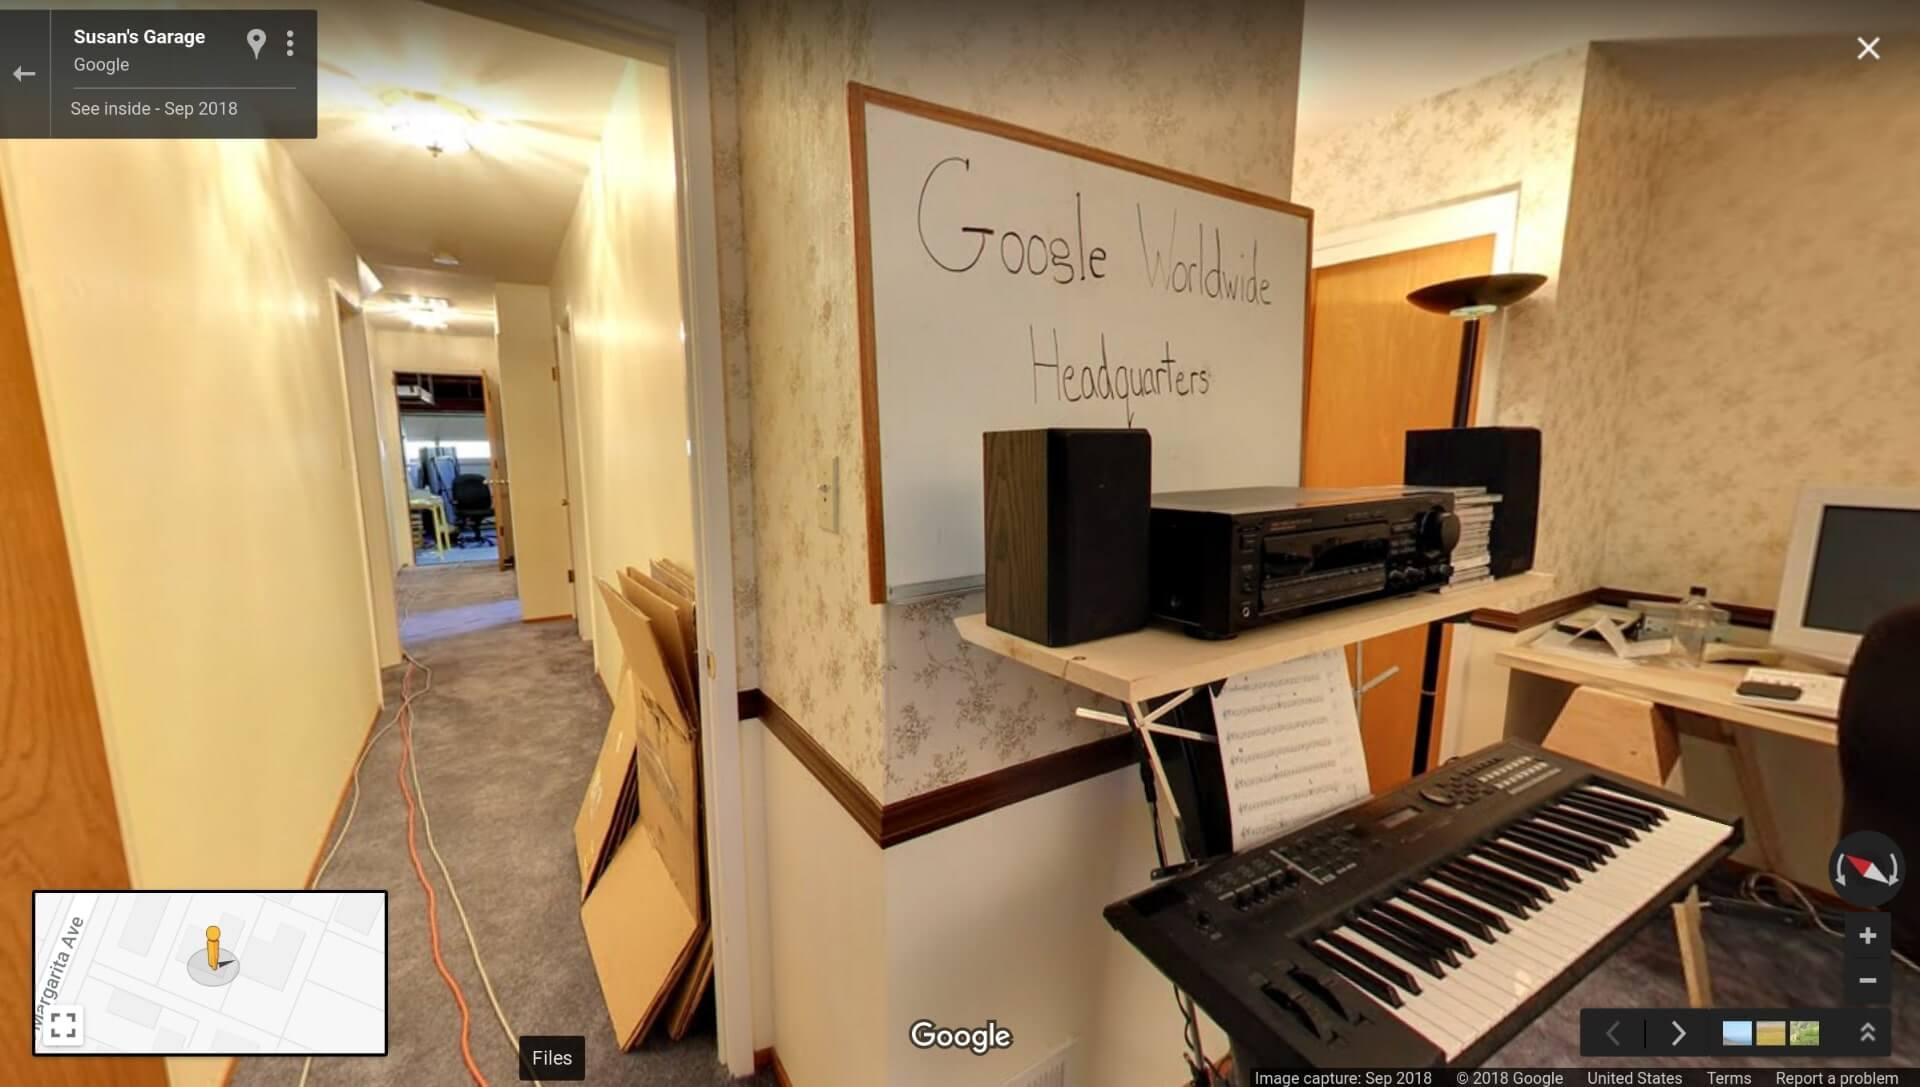 Google Recreates Original Garage Headquarters In Street View